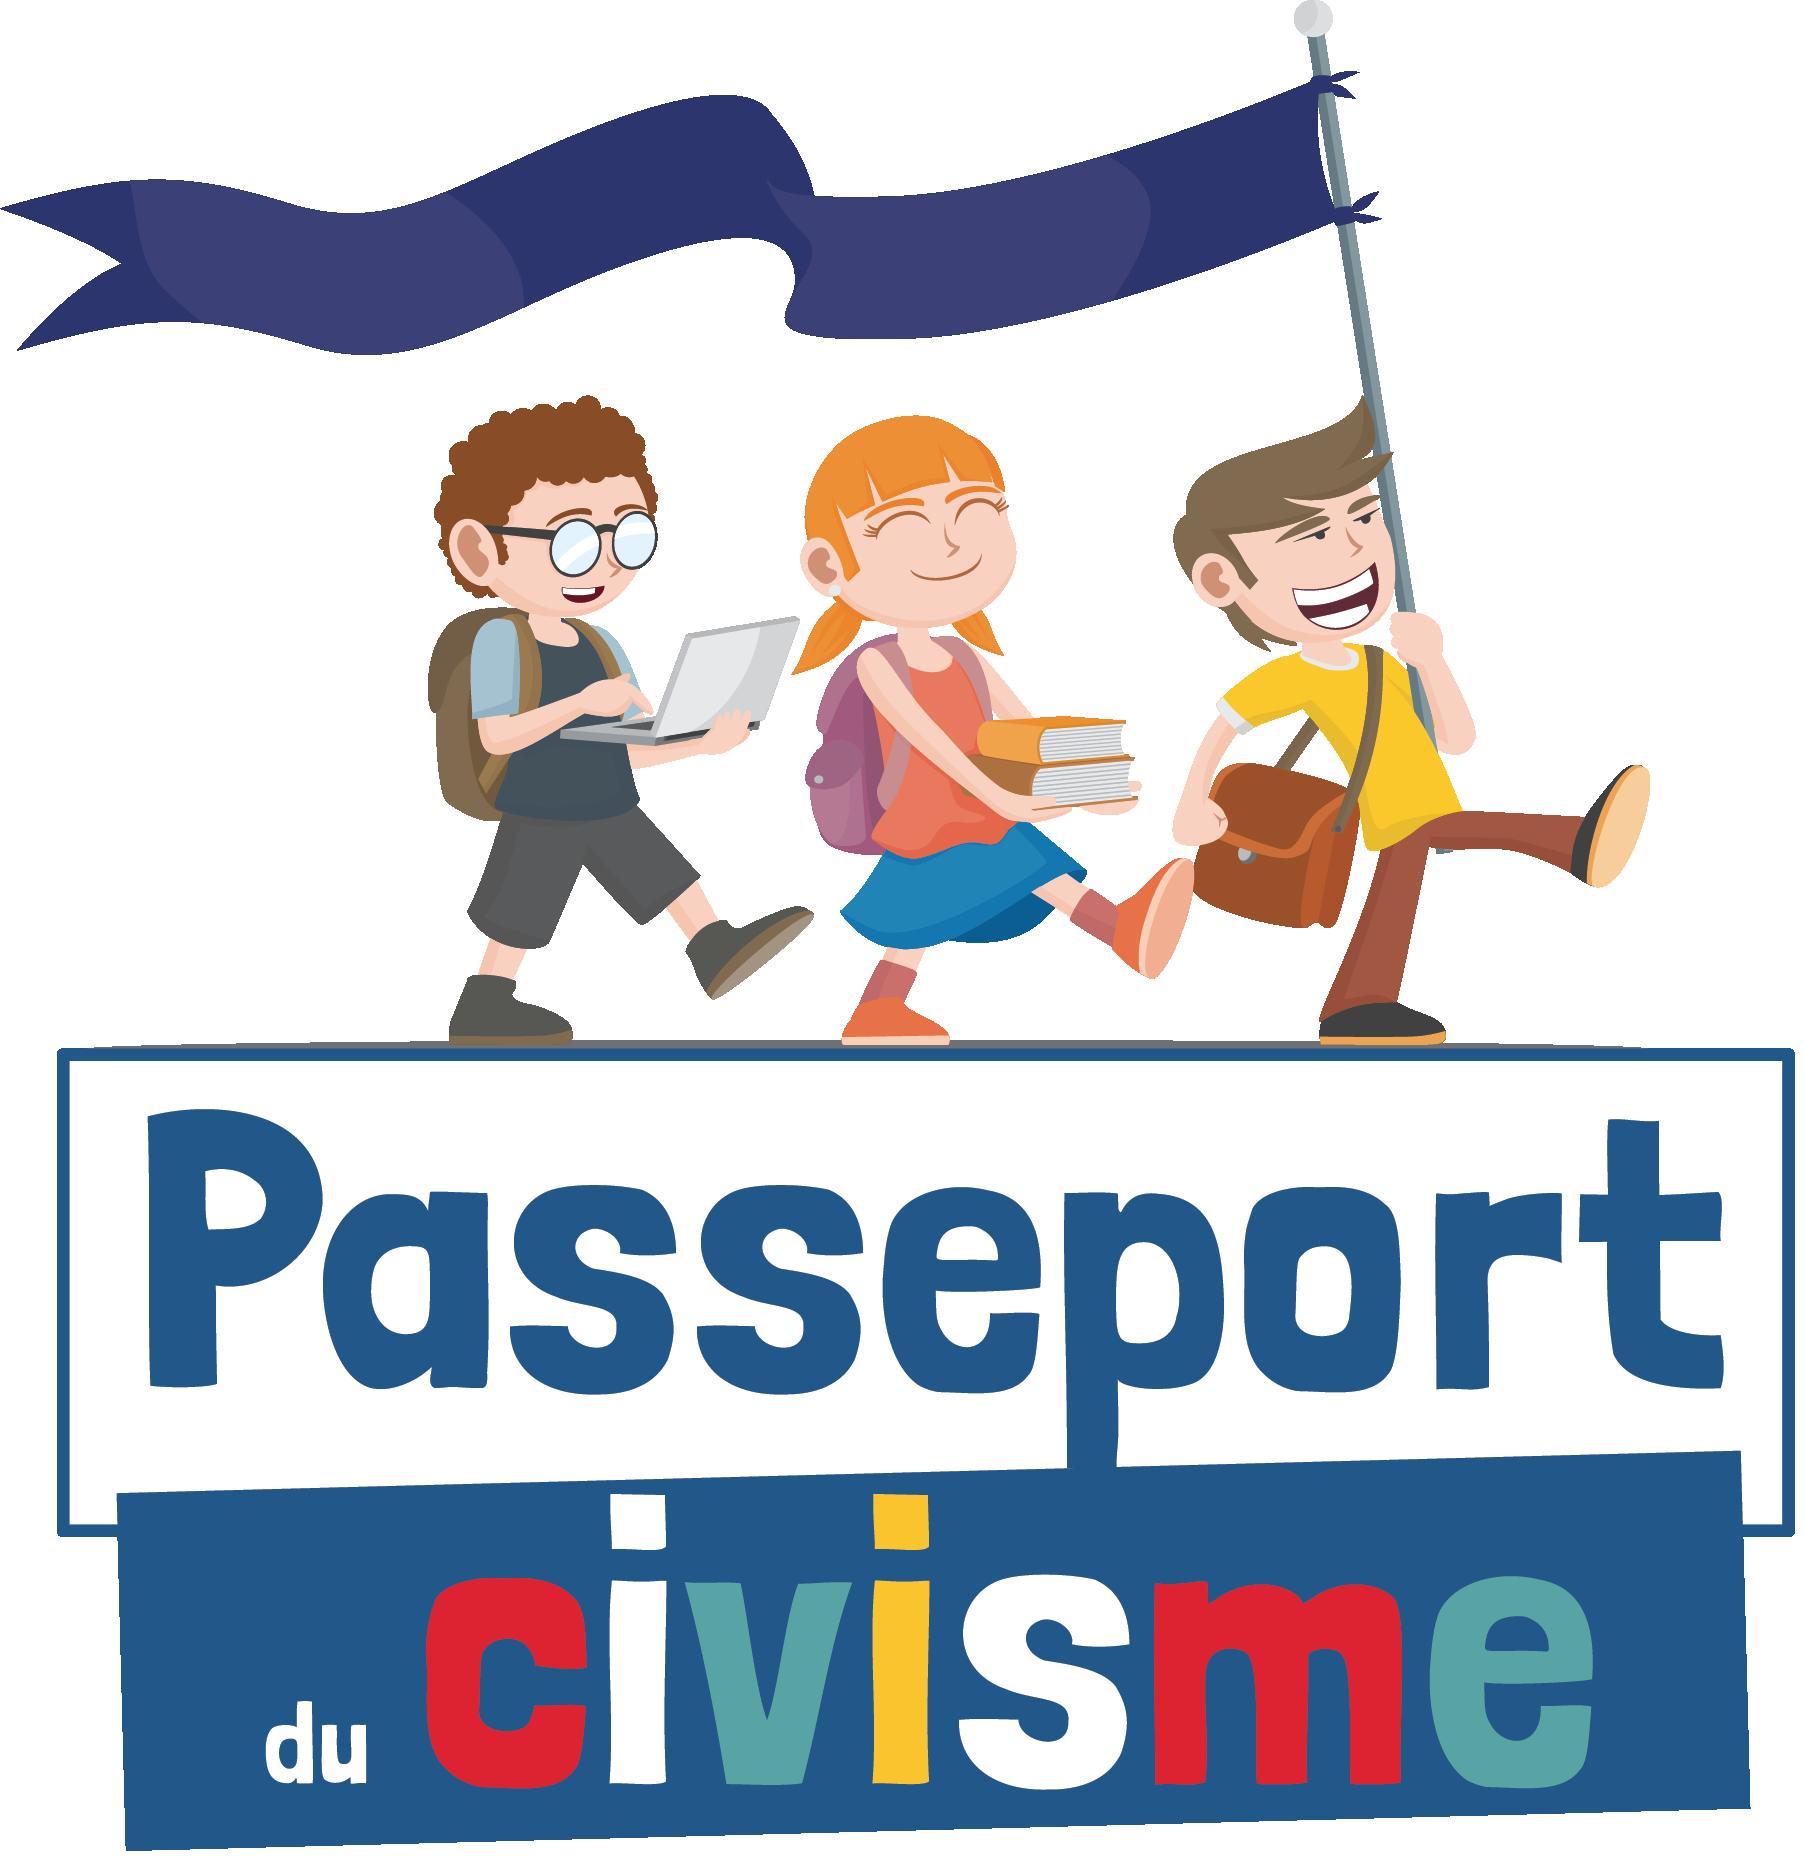 Passeport civisme logo